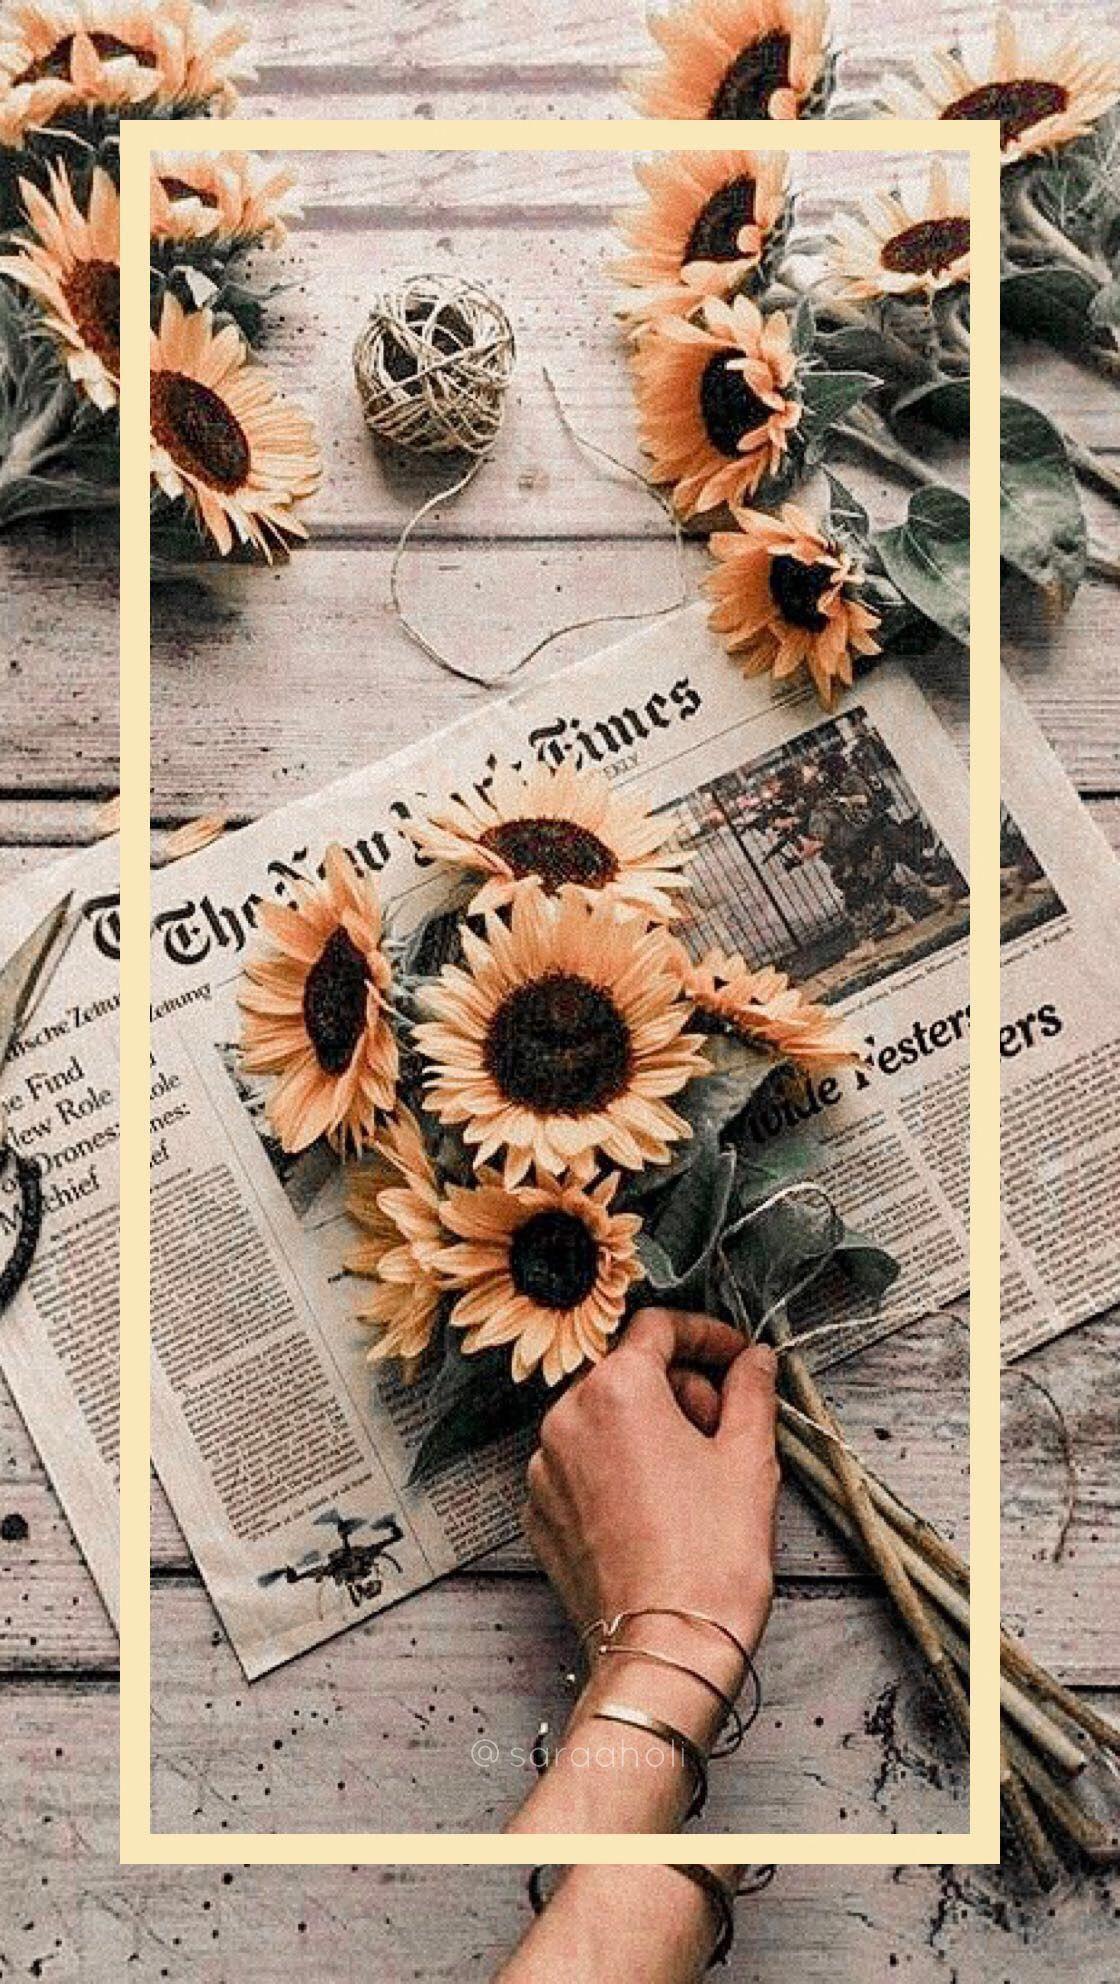 Aesthetic Aestheticwallpaper Iphonewallpaper Iphone Aesthetic Ipho Great Pretty Wallpa Aesthetic Iphone Wallpaper Sunflower Wallpaper Phone Wallpaper